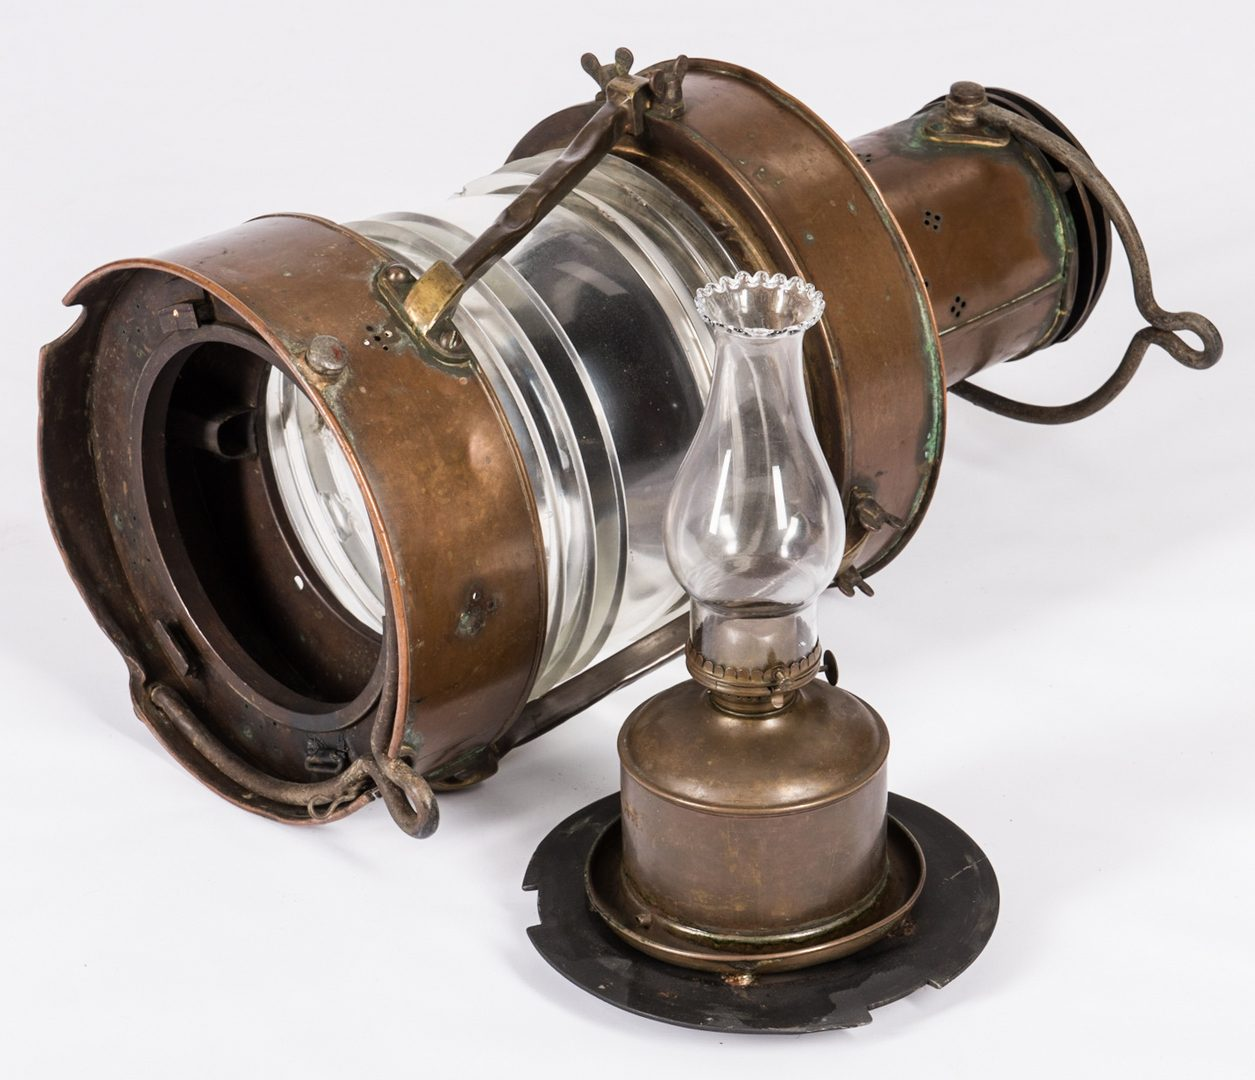 Lot 783: Telford, Grier & Mackay Ltd. Anchor Lantern